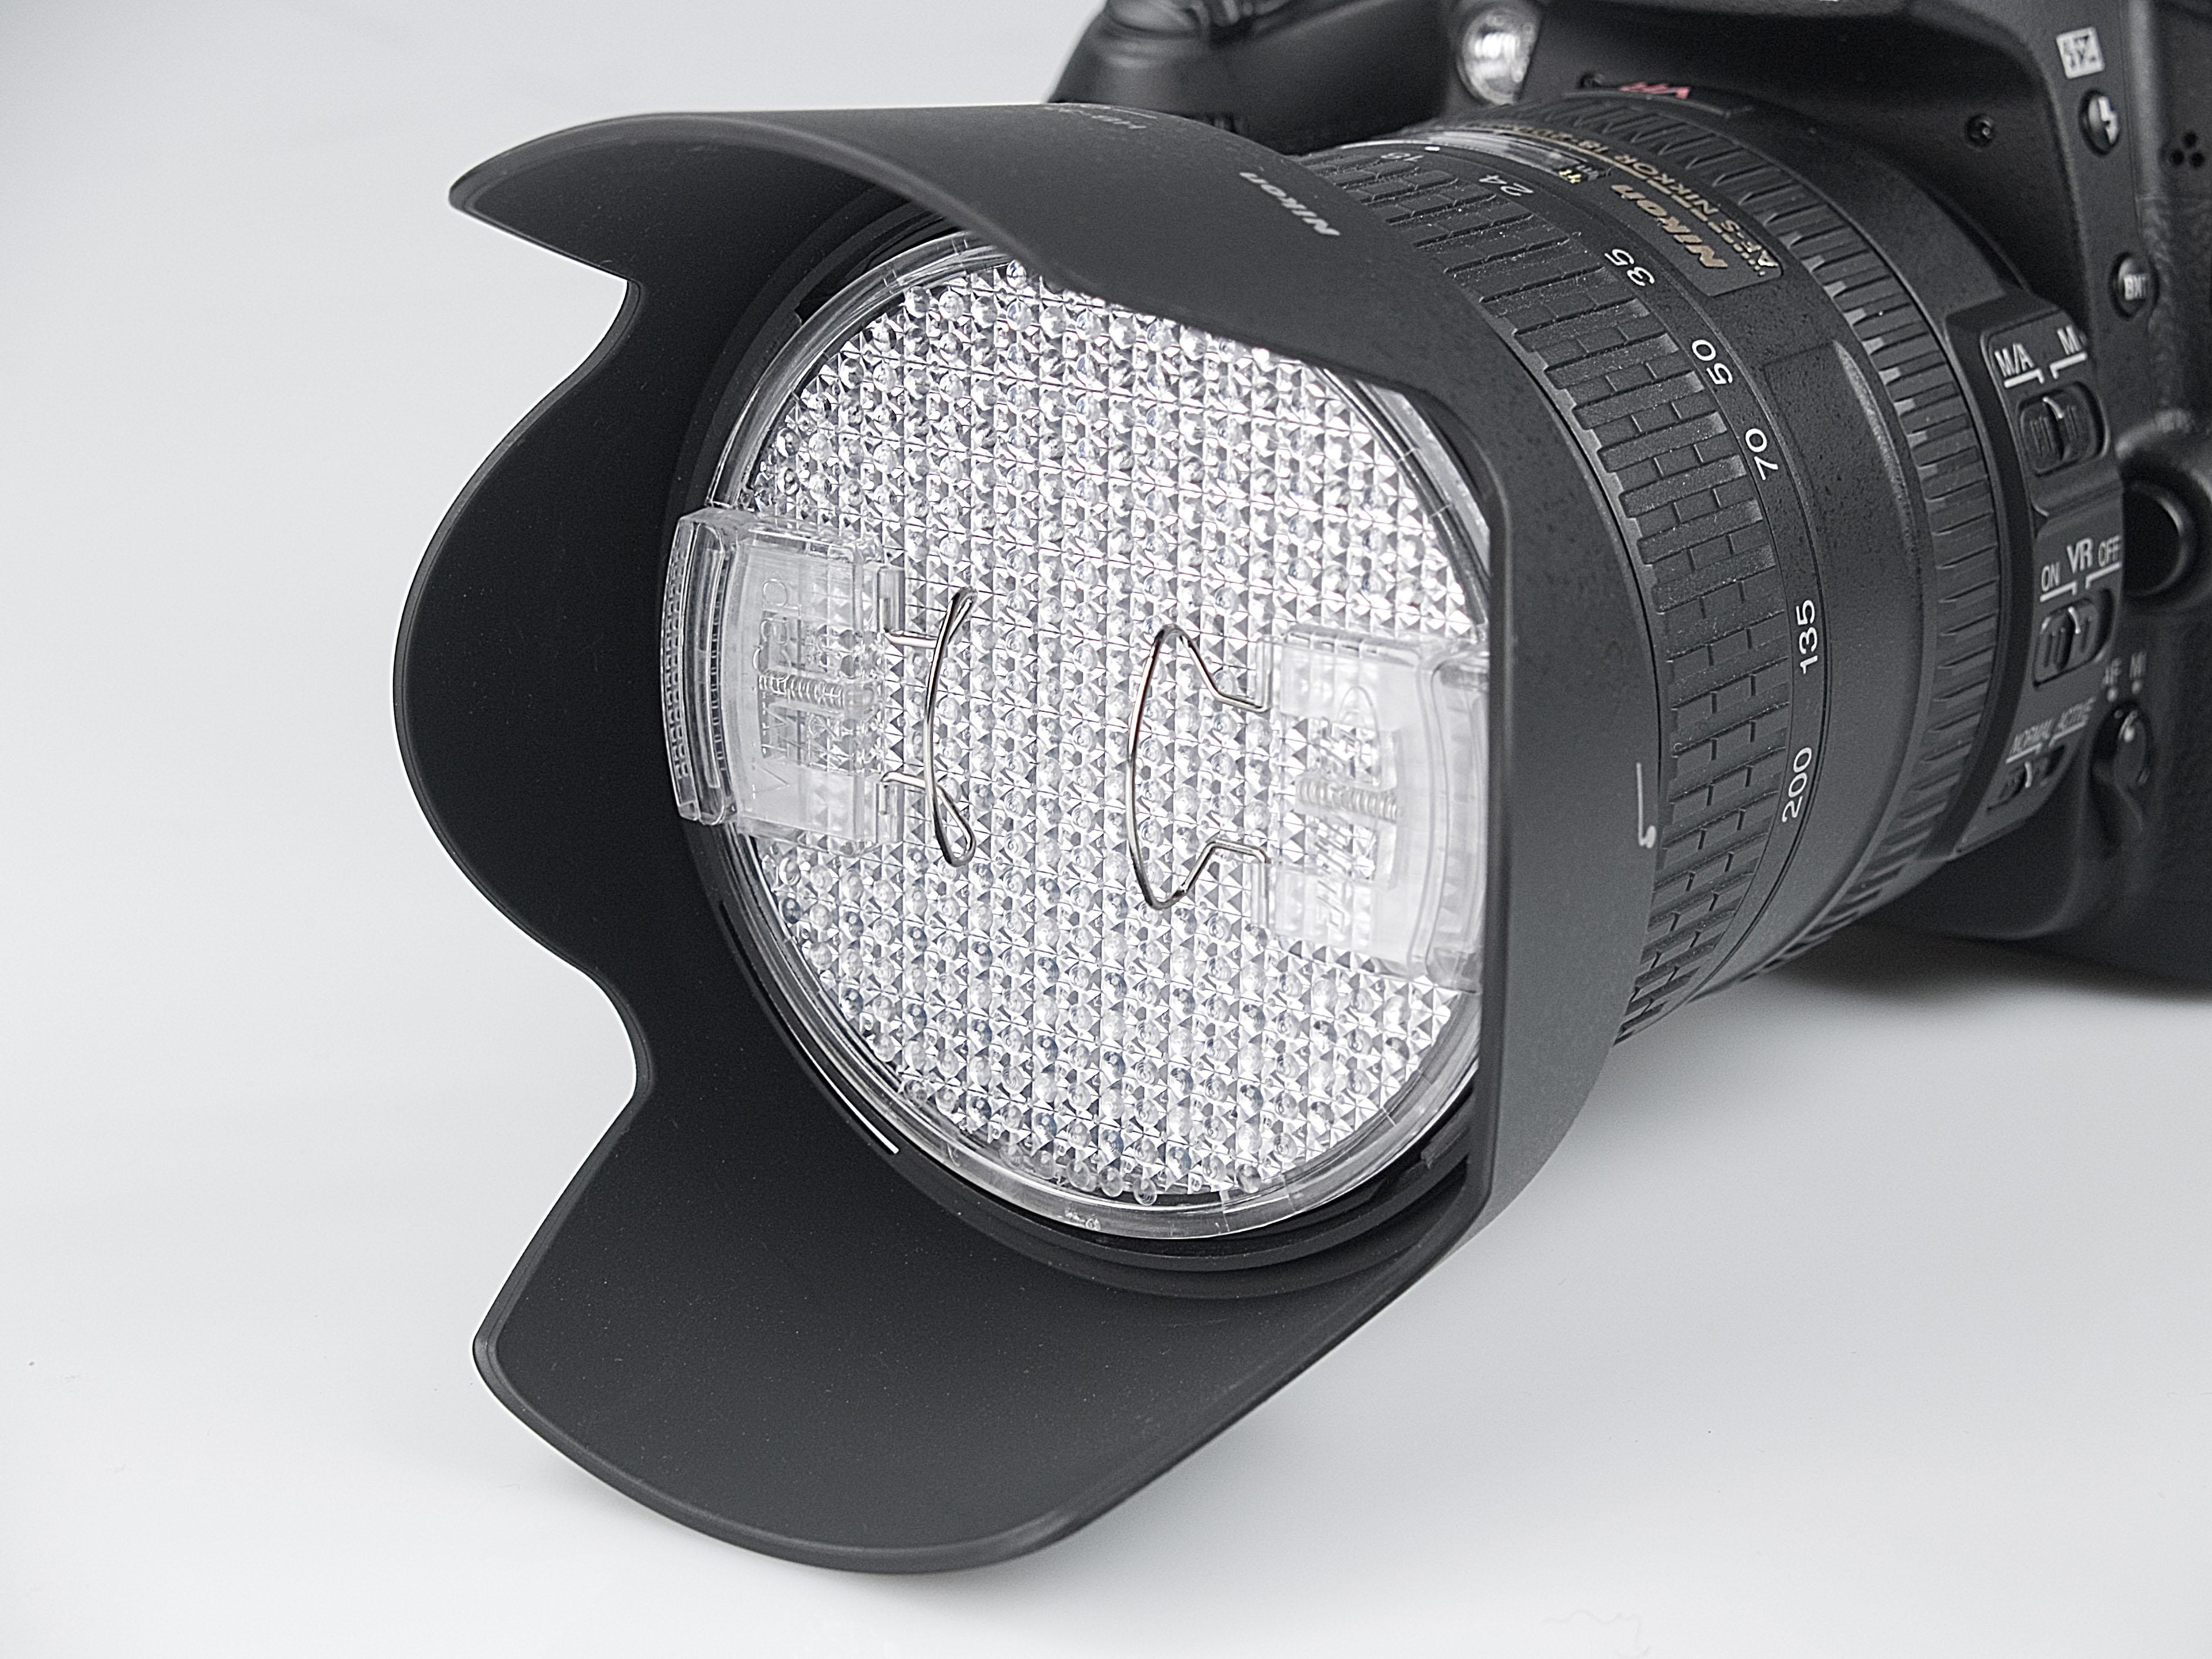 KAISER Weißabgleich-Filter Vivicap ø 72 mm